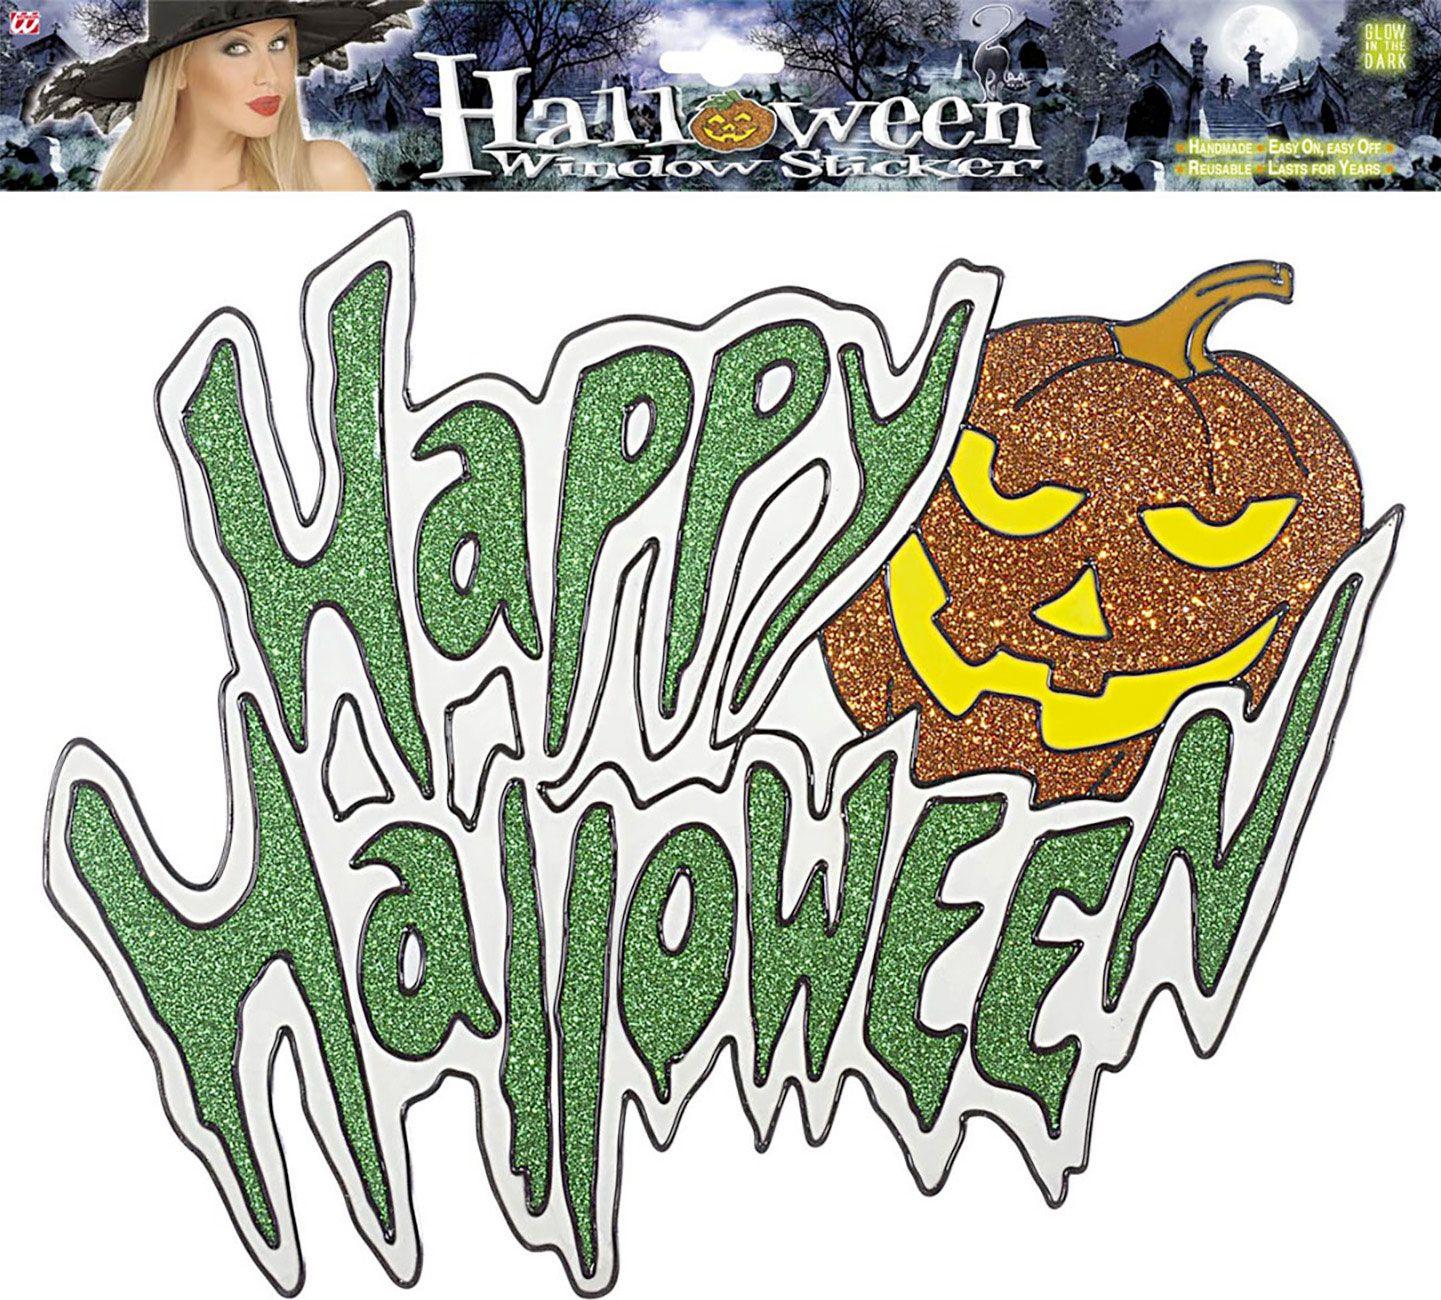 Halloween glow in the dark raam sticker